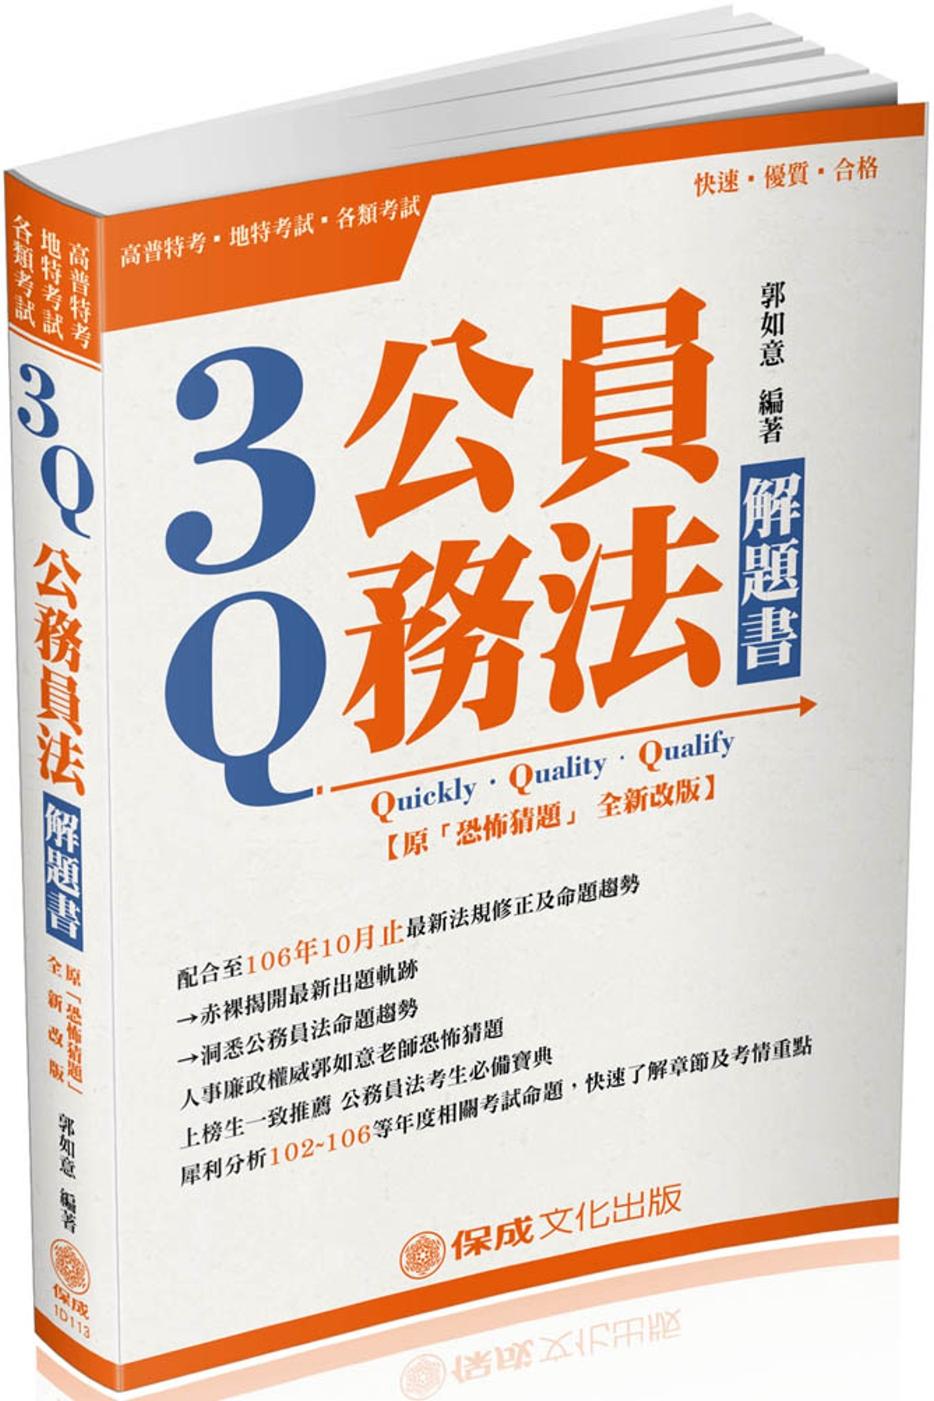 3Q公務員法-解題書(原:恐怖猜題)-2018高普特考<保成>(十一版)